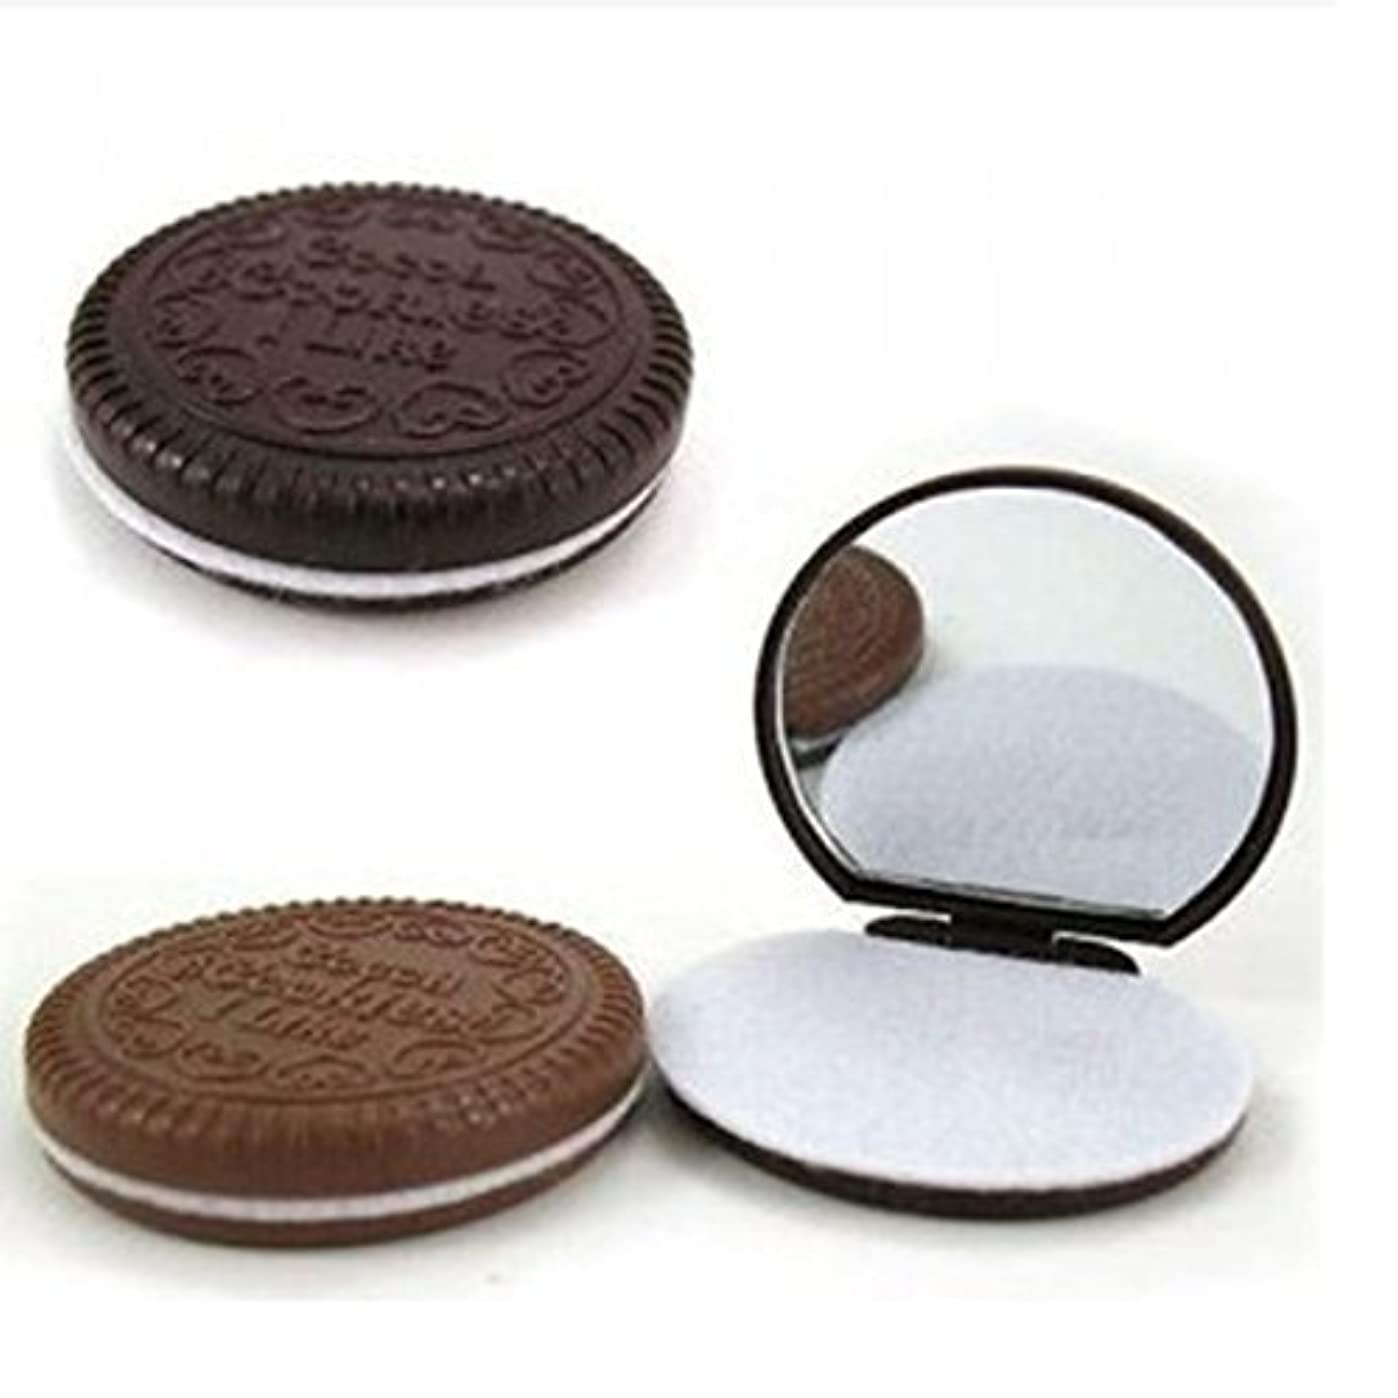 3 Pcs Cute Chocolate Makeup Mirror With Comb Women Hand Pocket Compact Makeup Tools Great Gift [並行輸入品]